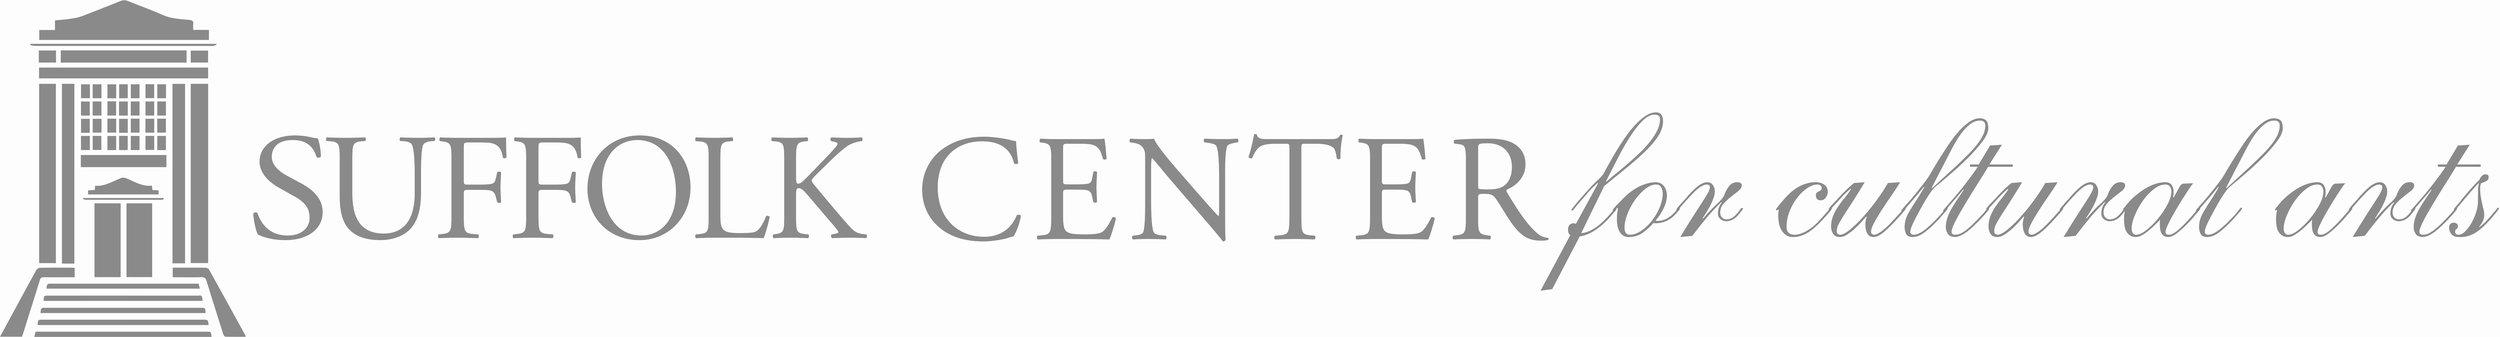 KWD_Clients_Suffolk-Center-for-Cultural-Arts-logo-bw.jpg